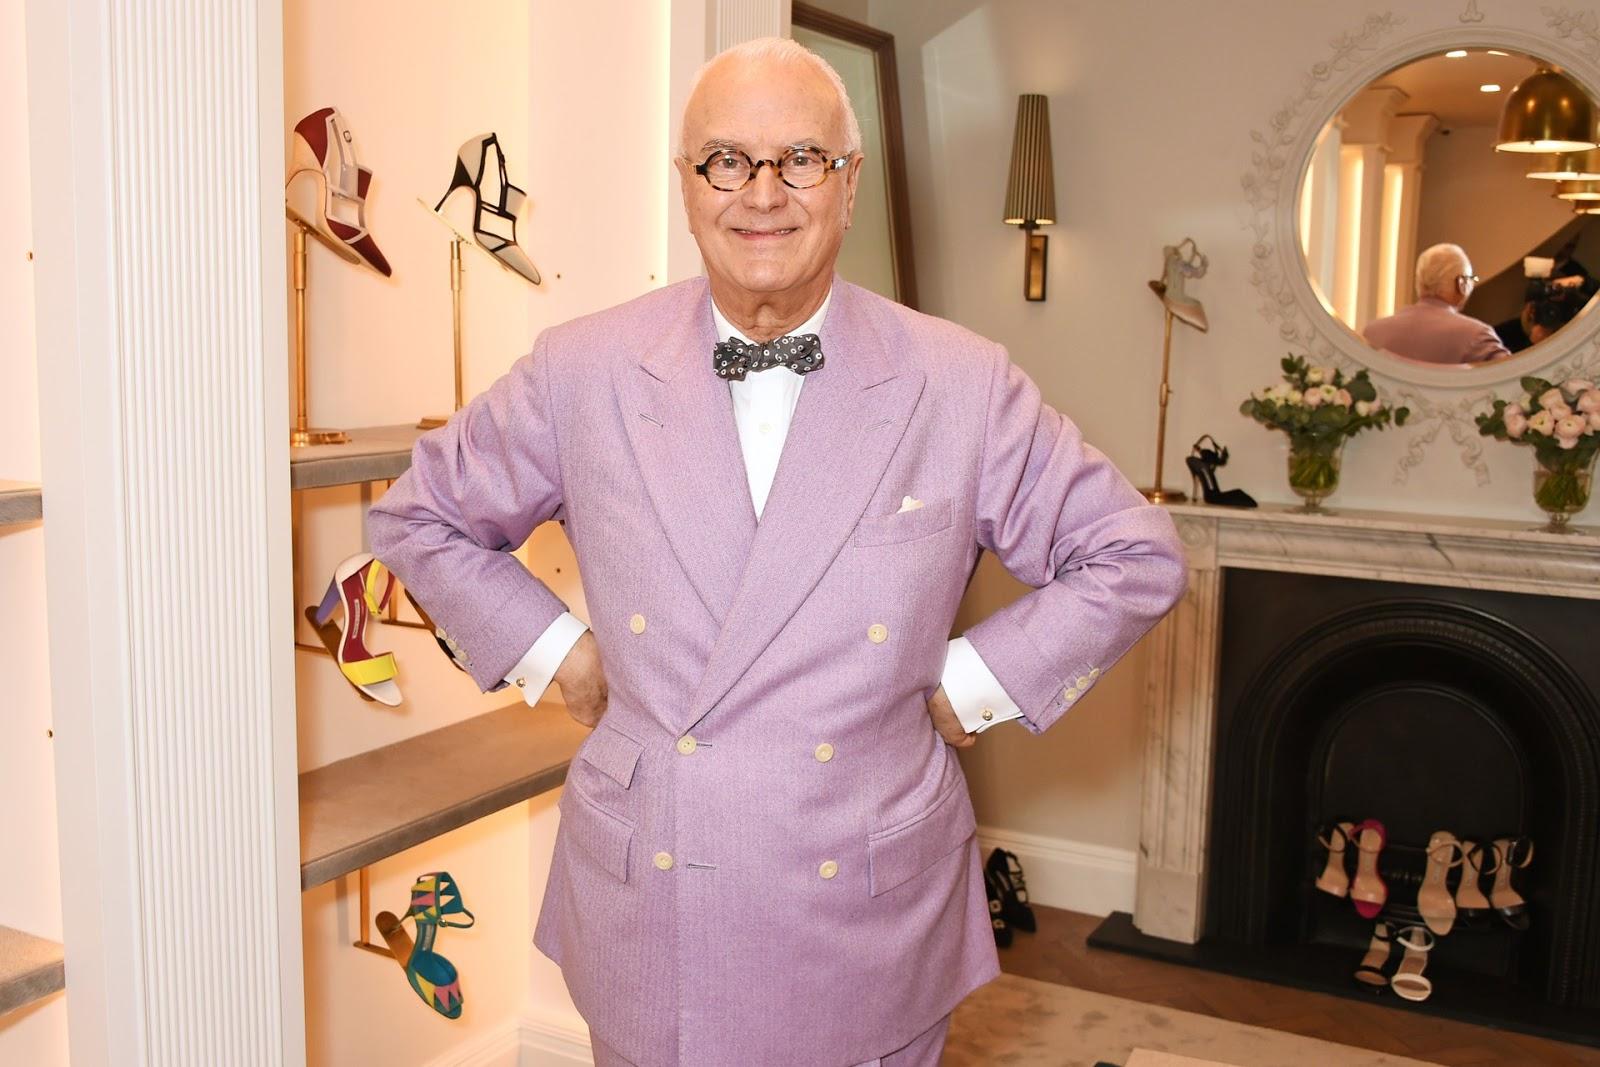 Manolo Blahnik online store launches / fashion news via www.fashionedbylove.co.uk